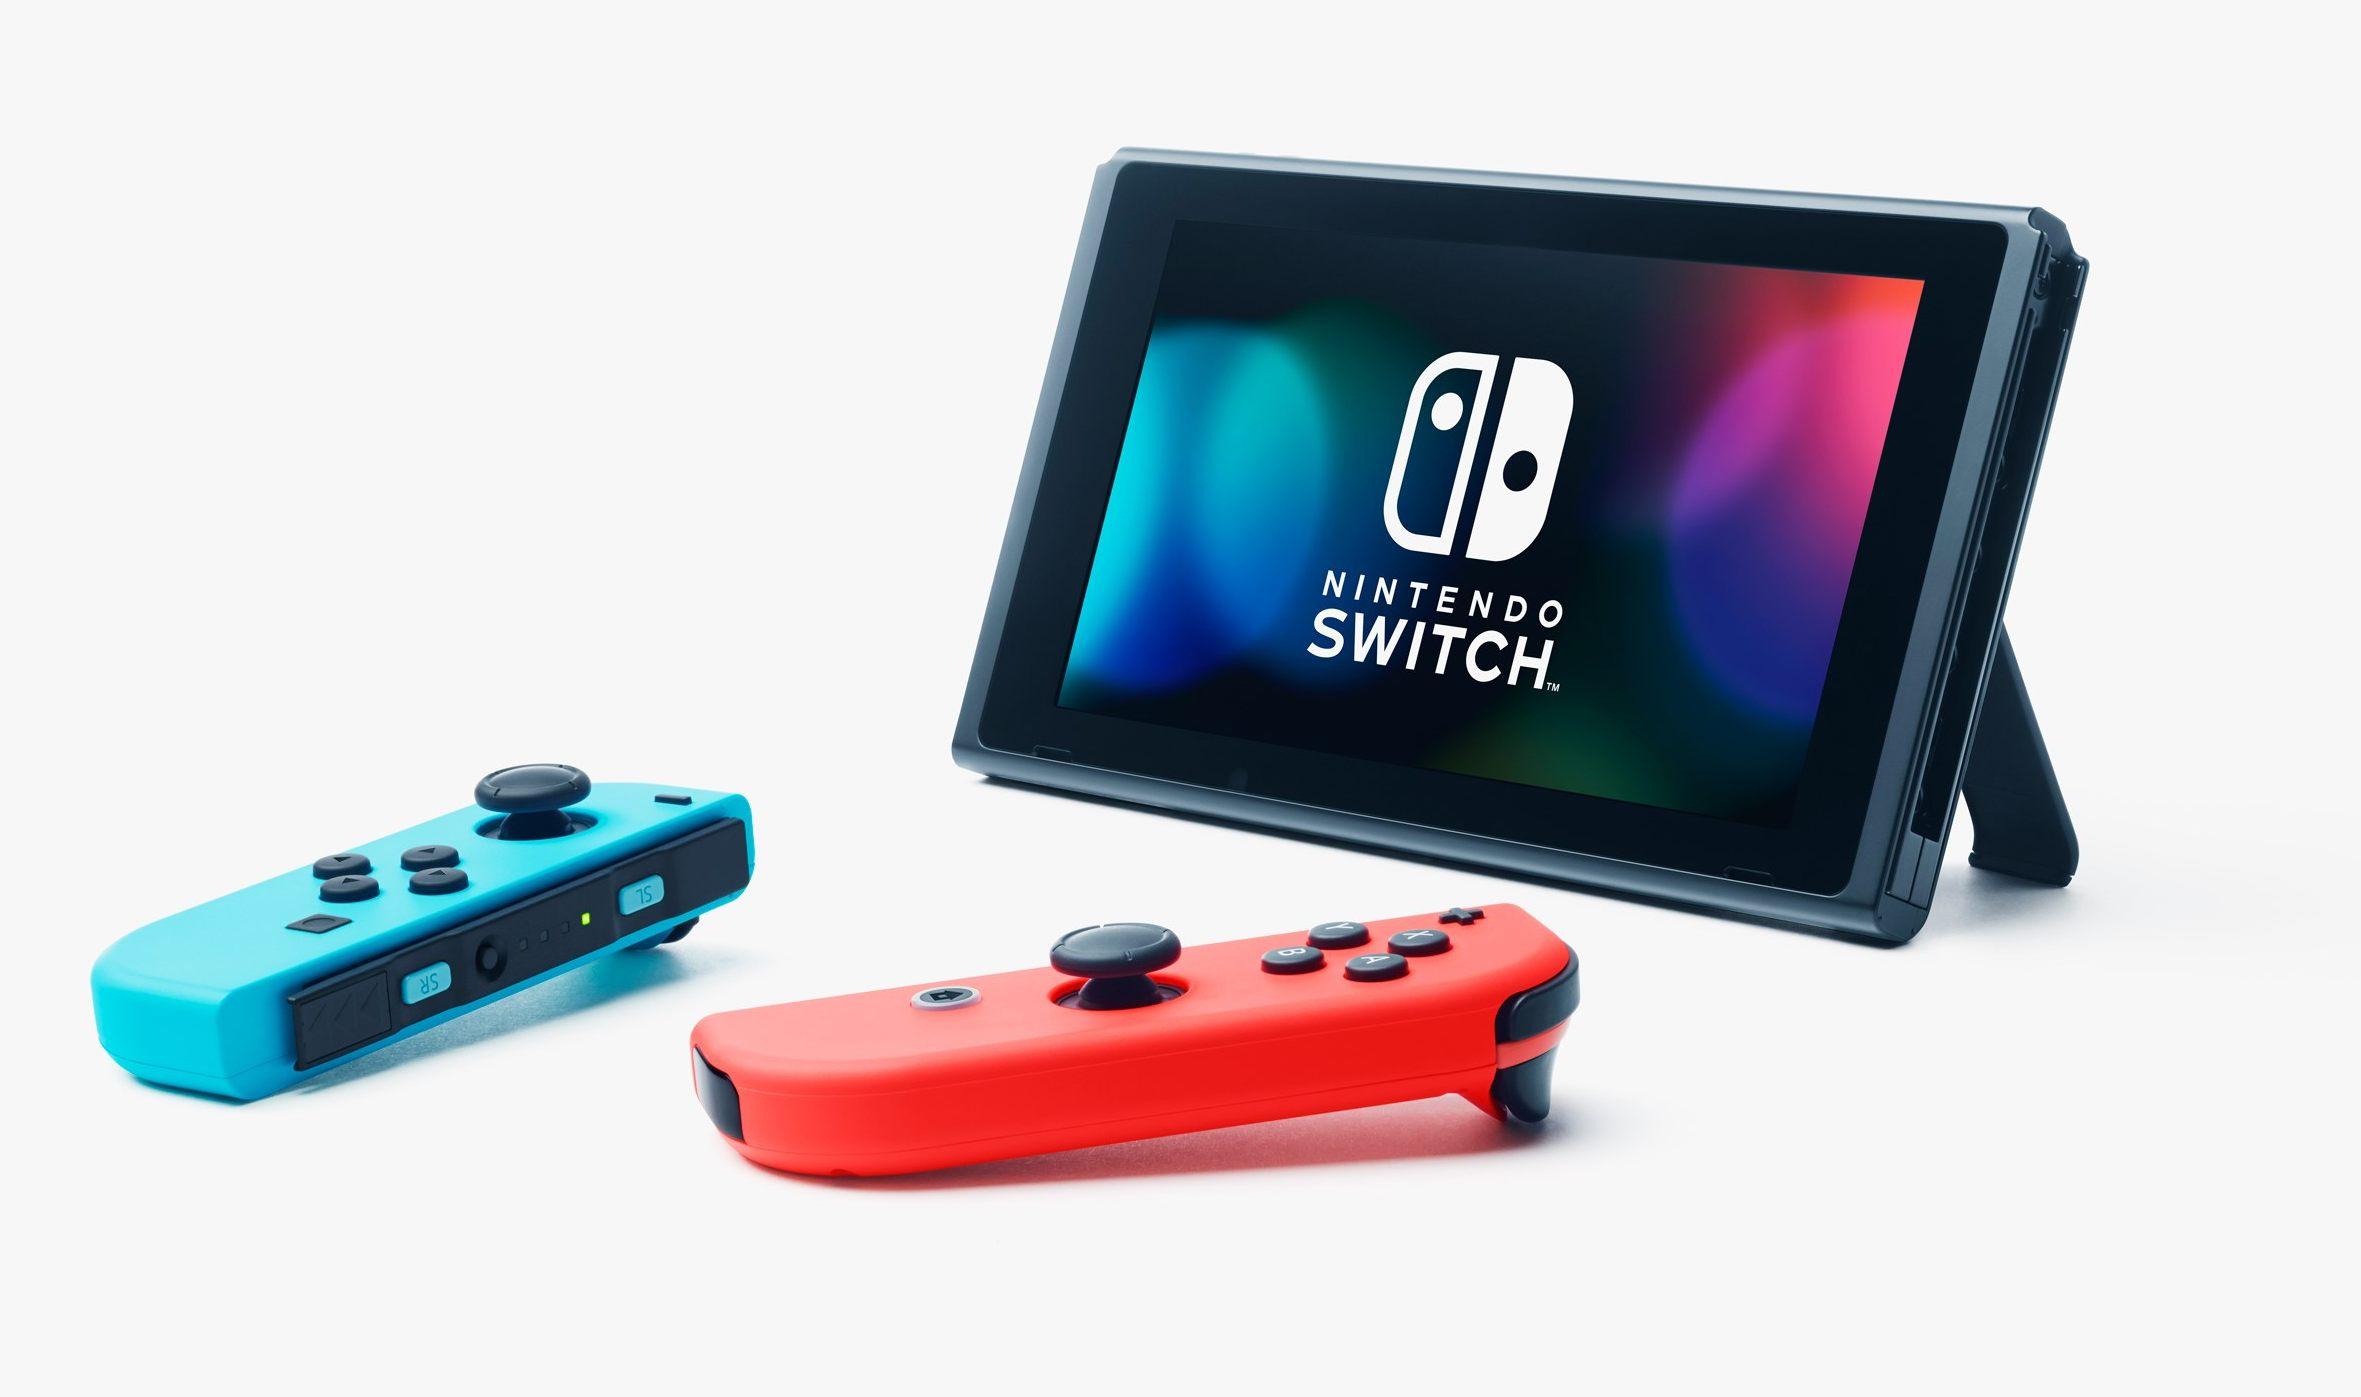 nintendo switch console shipped 33 million